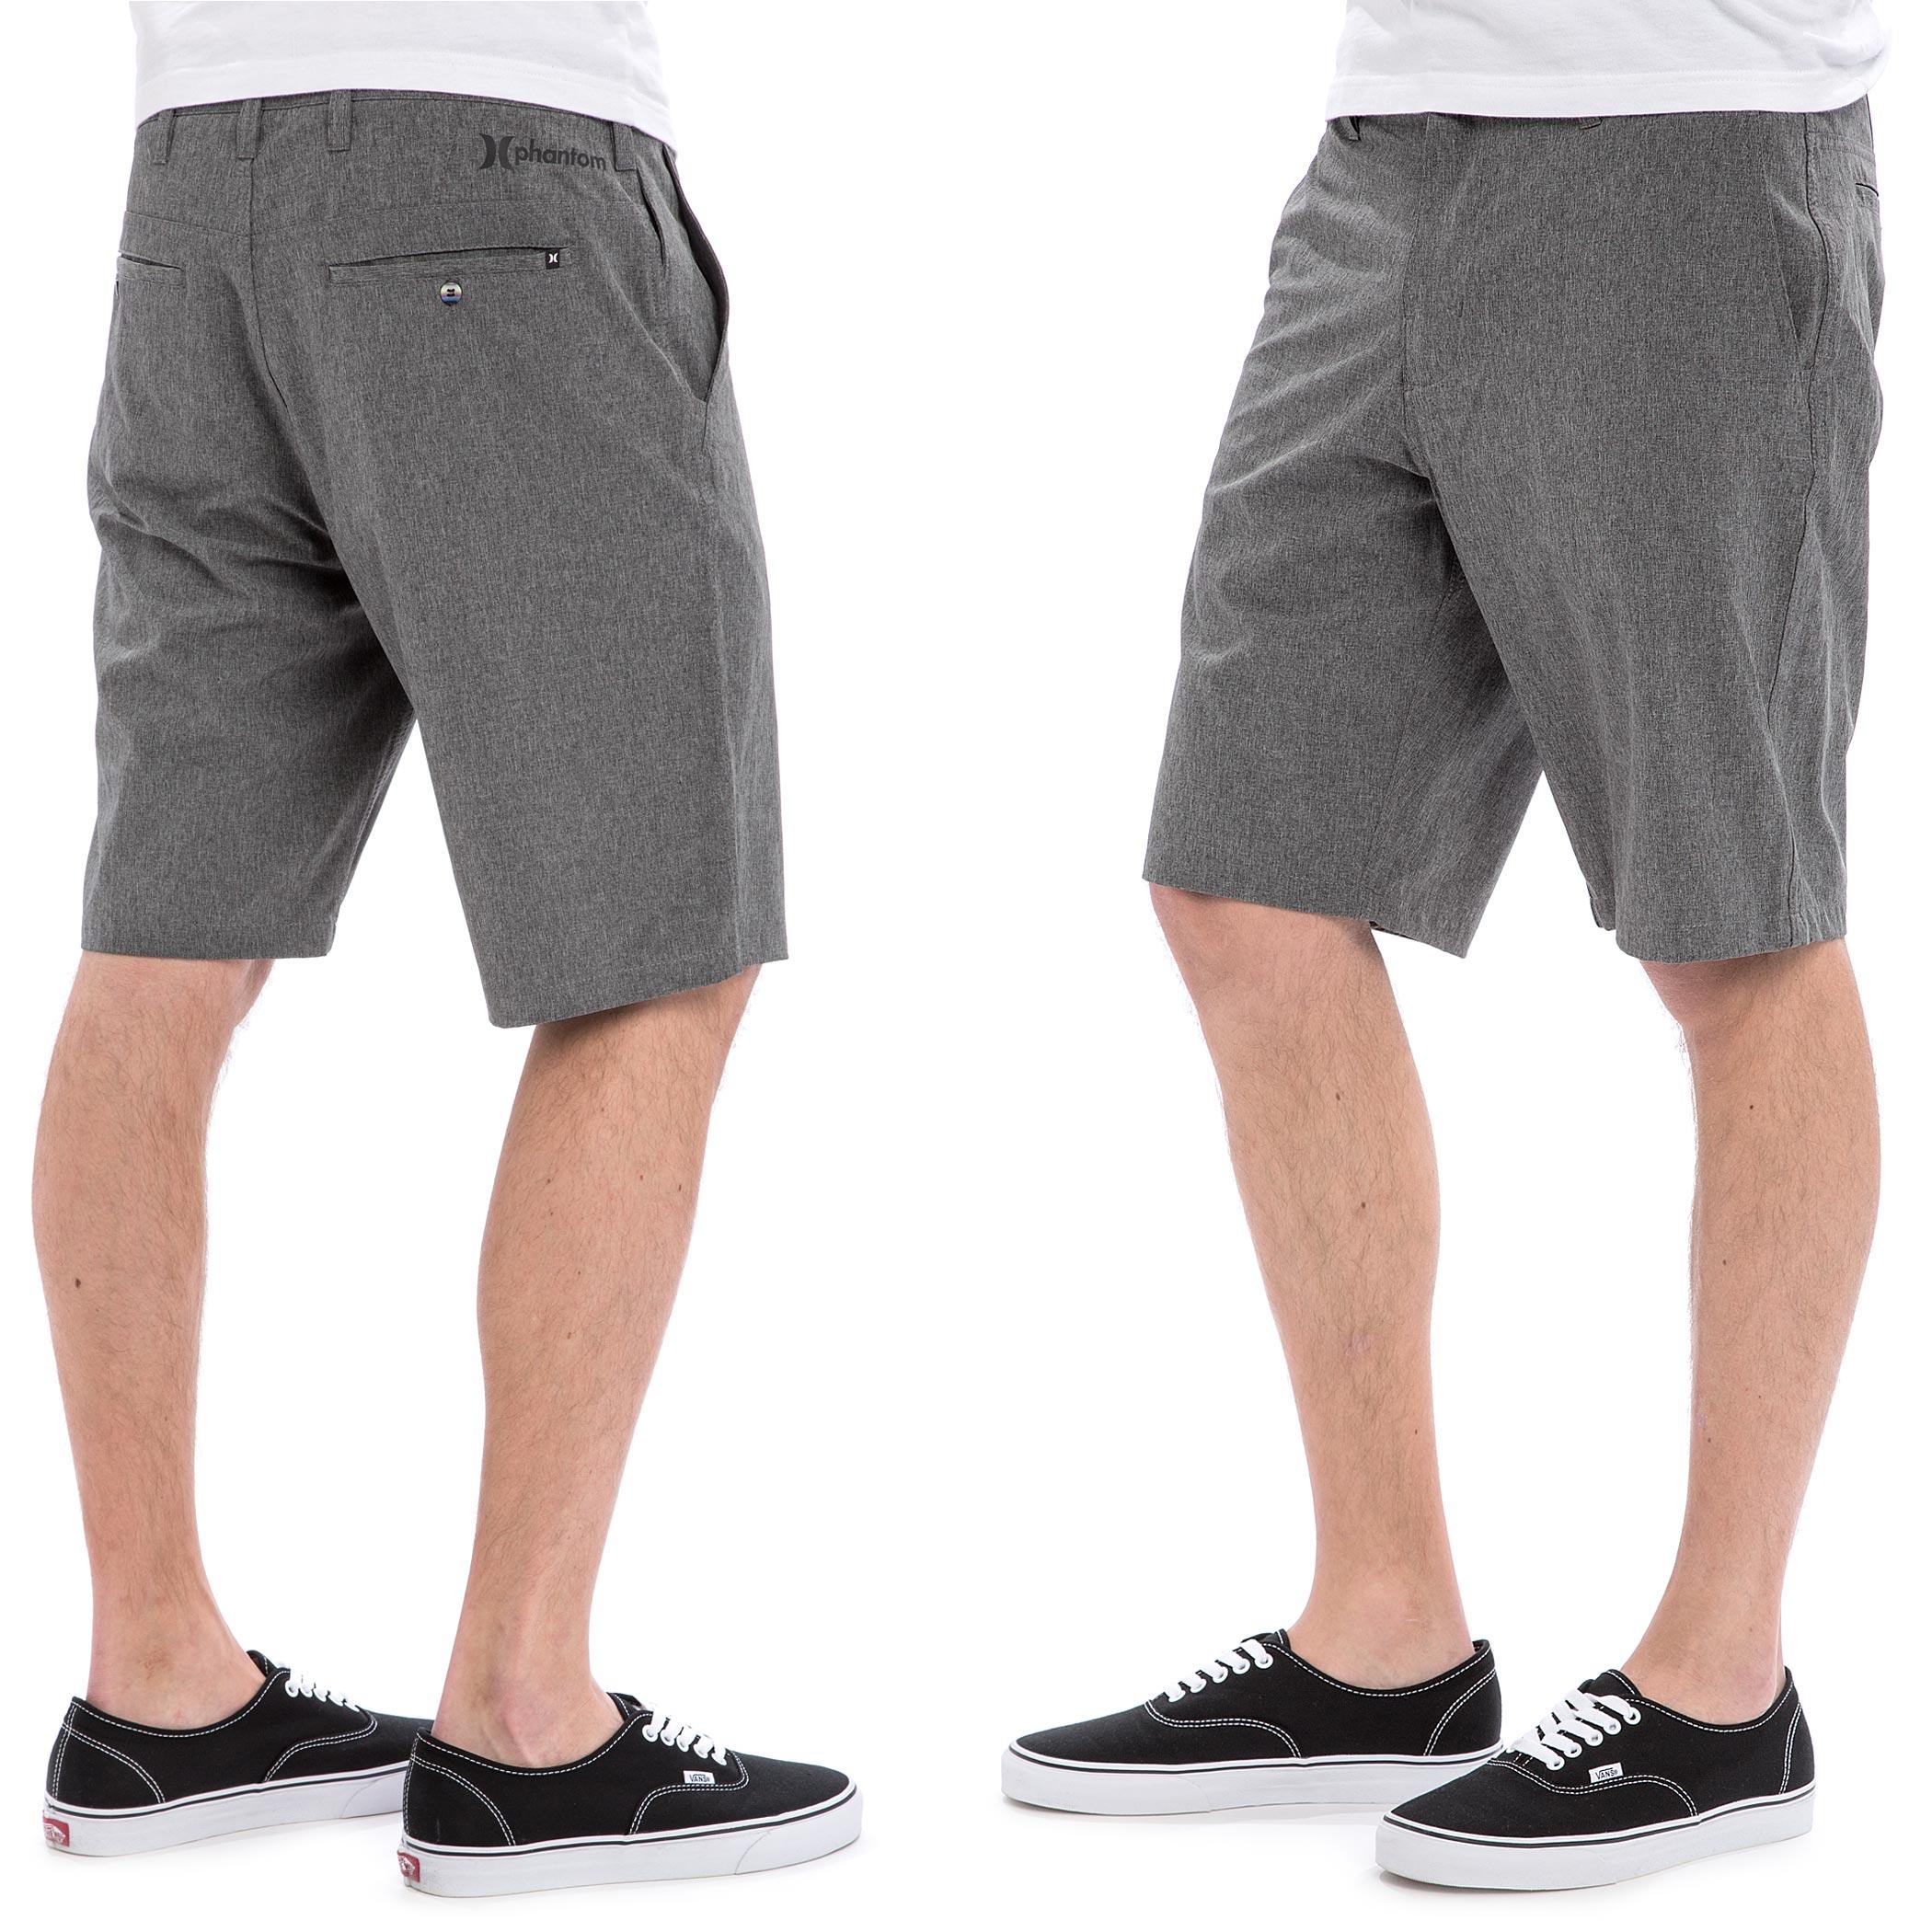 Hurley Phantom Boardwalk Shorts (heather black) buy at skatedeluxe 6b6121ddb973